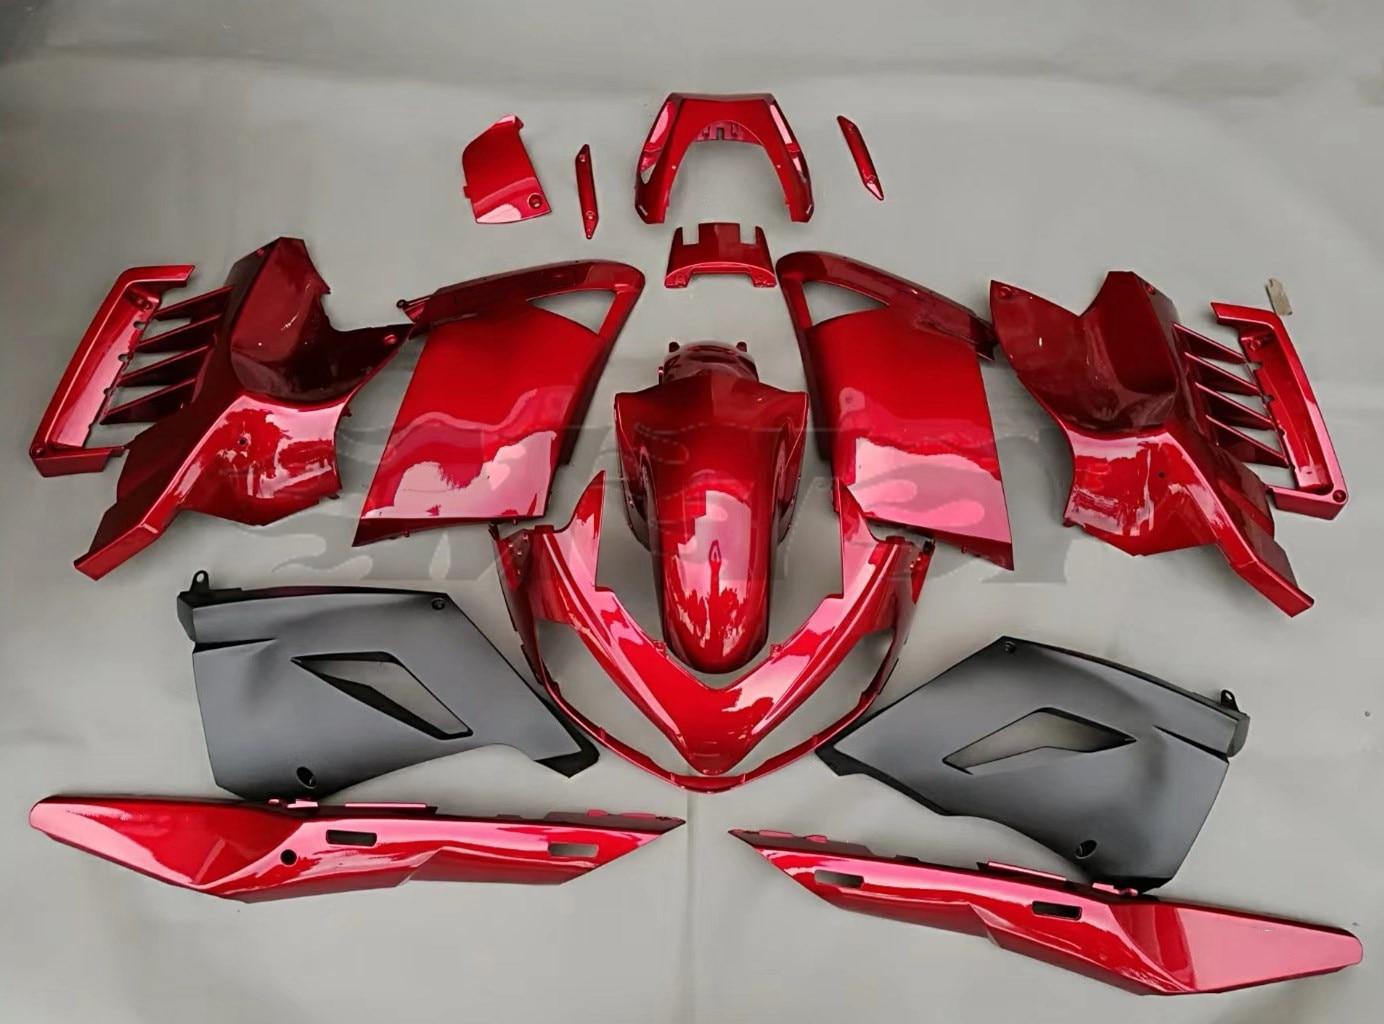 Kawasaki Concours Fairing Parts